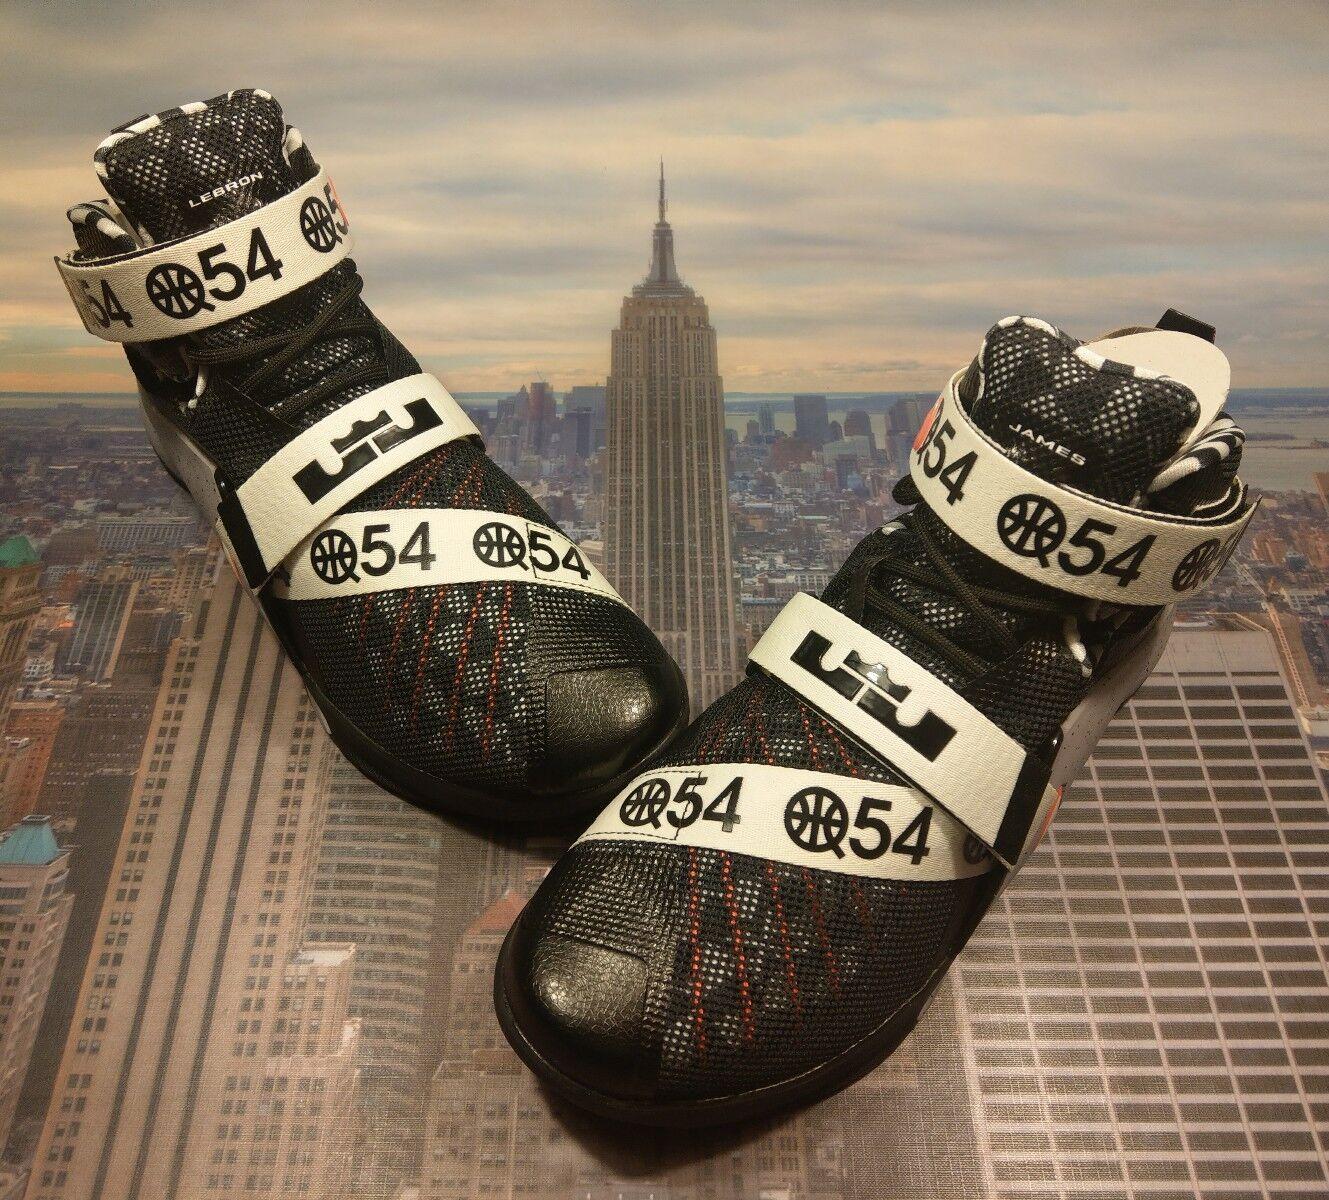 Nike lebron soldato ix 9 lmtd q54 quai 54 nero 810803 015 nuove dimensioni limitate